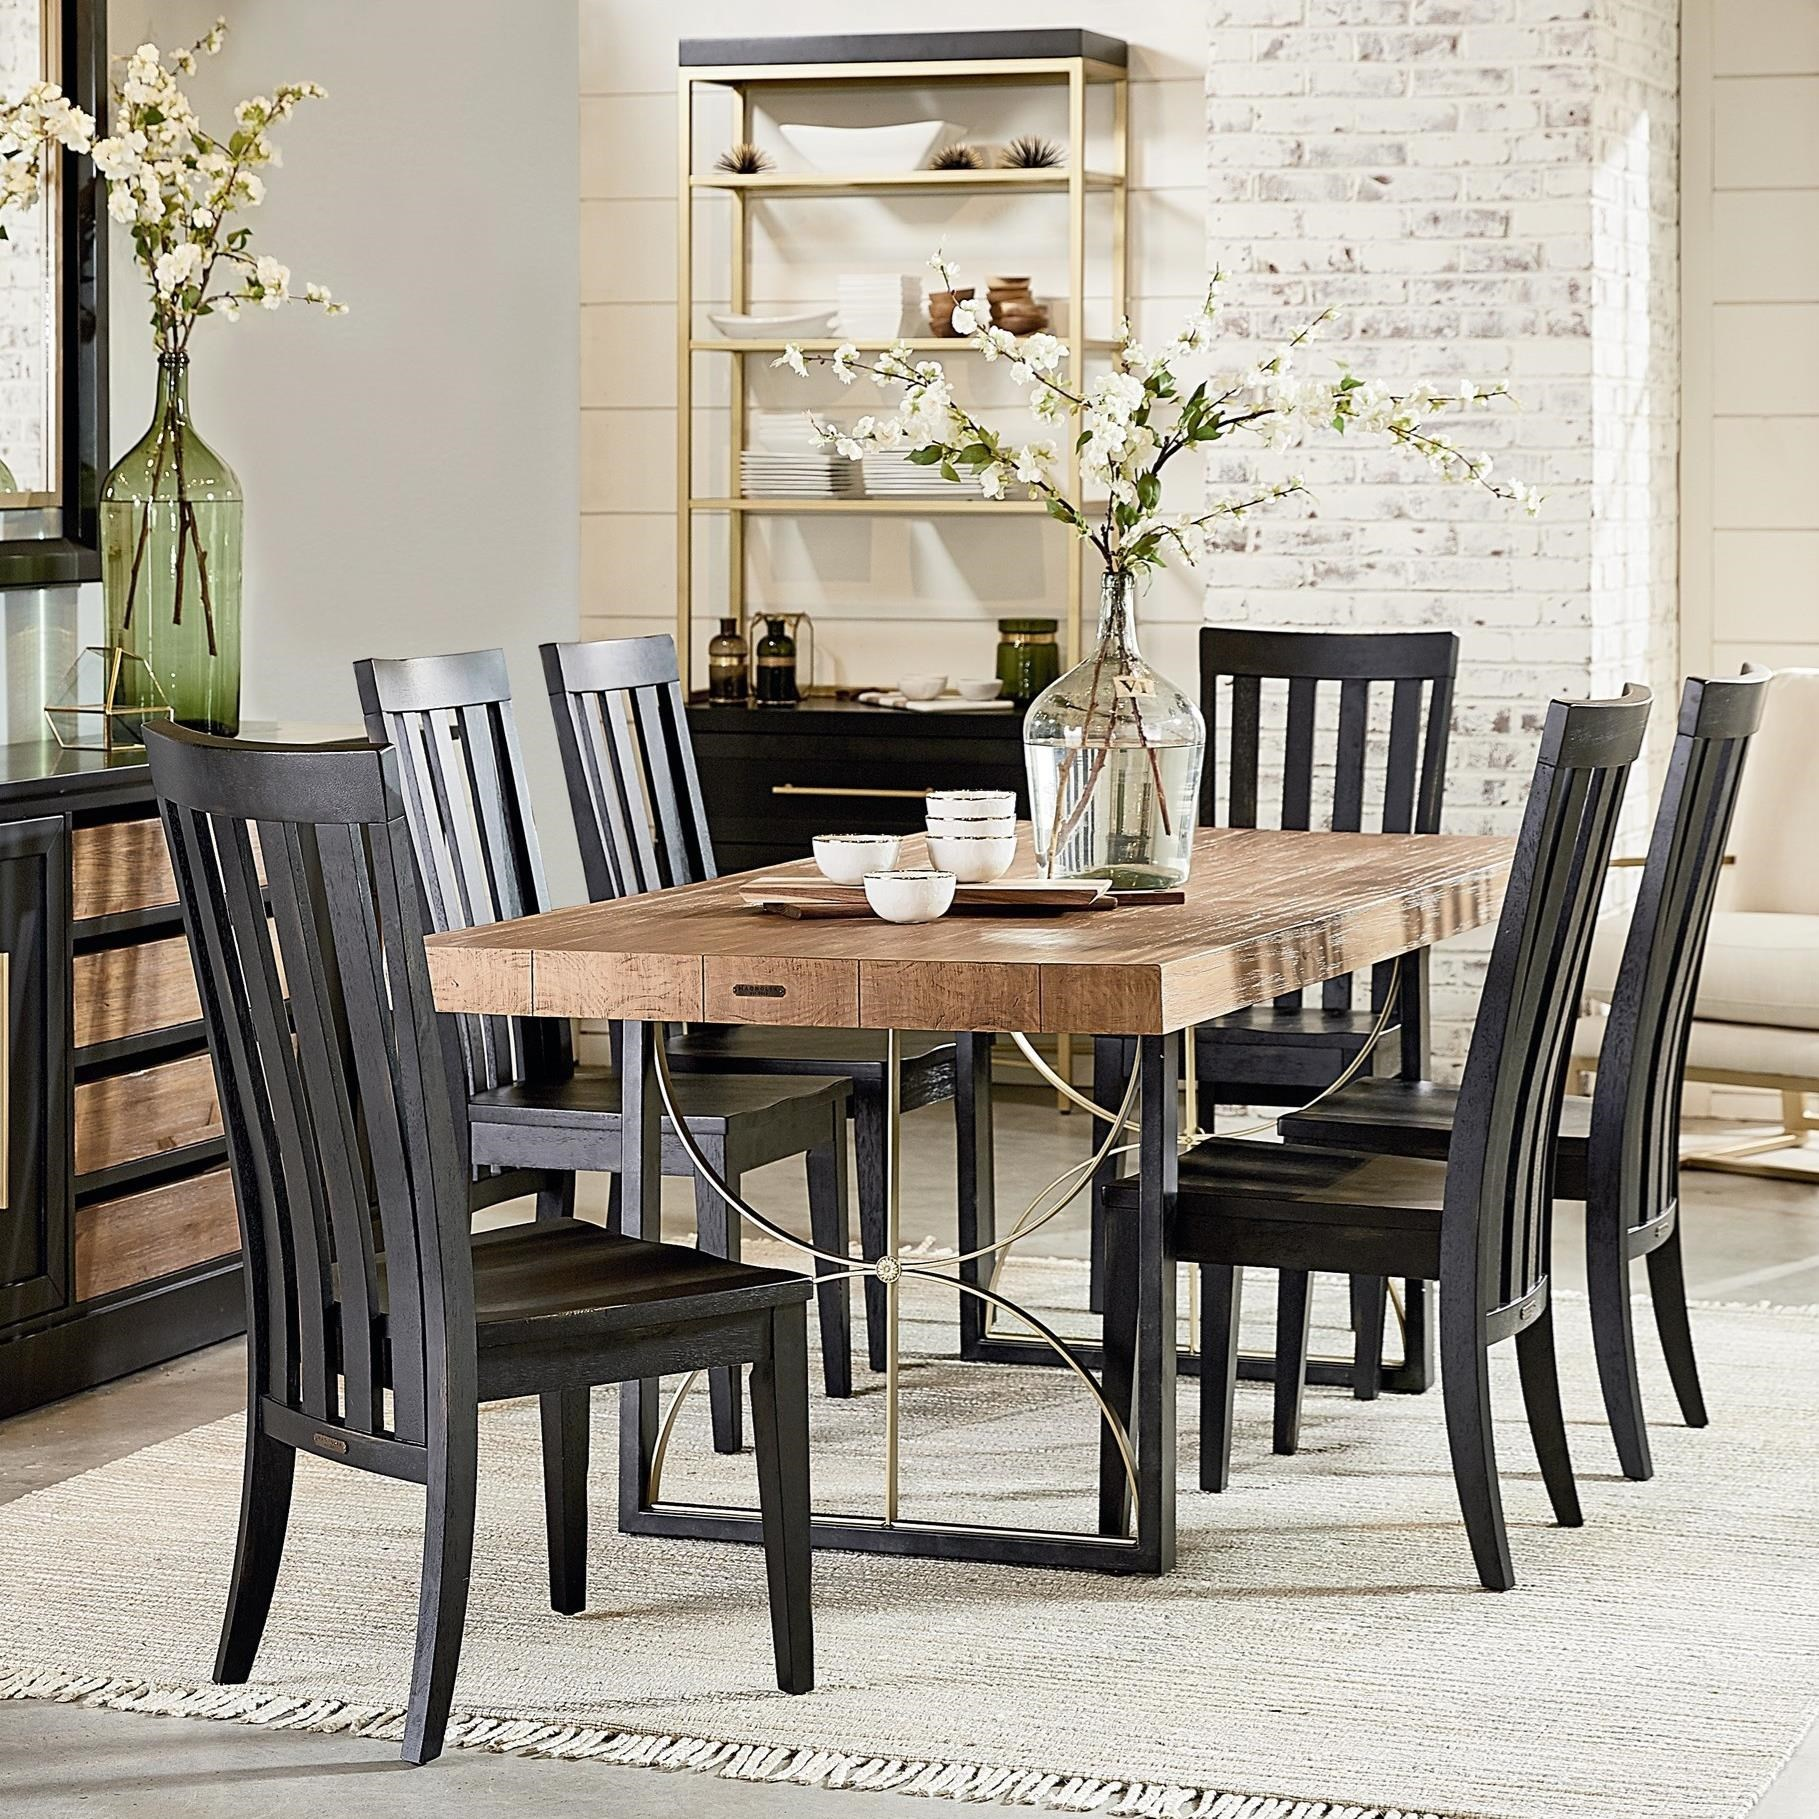 Magnolia Furniture Dining Room Tables Magnolia Home Breakfast